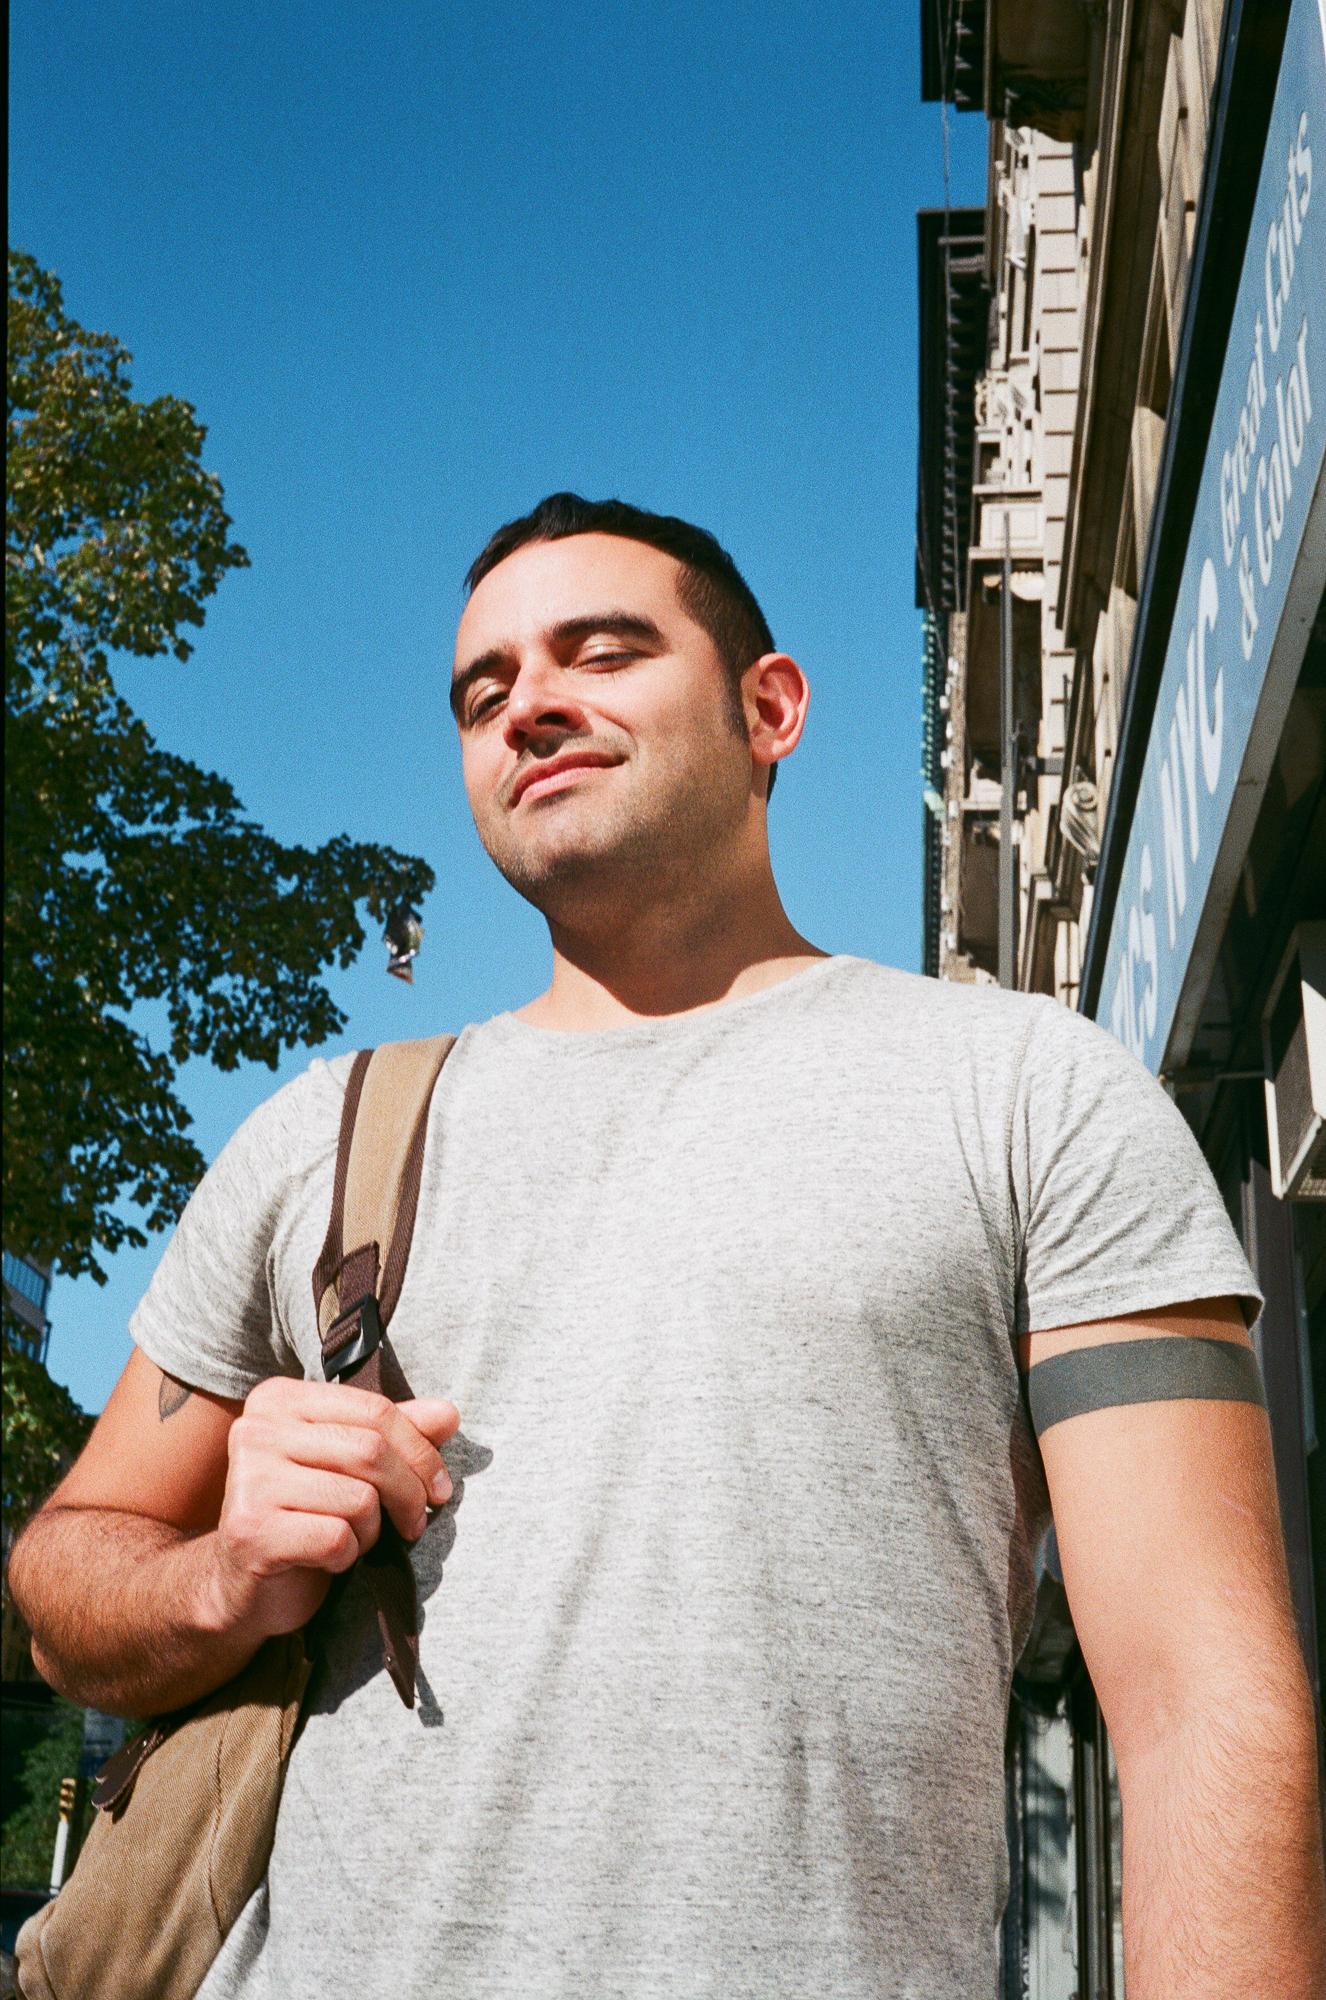 Fernando on Broadway in Harlem. Canonet QL17, Fuji Superia X-Tra 400.